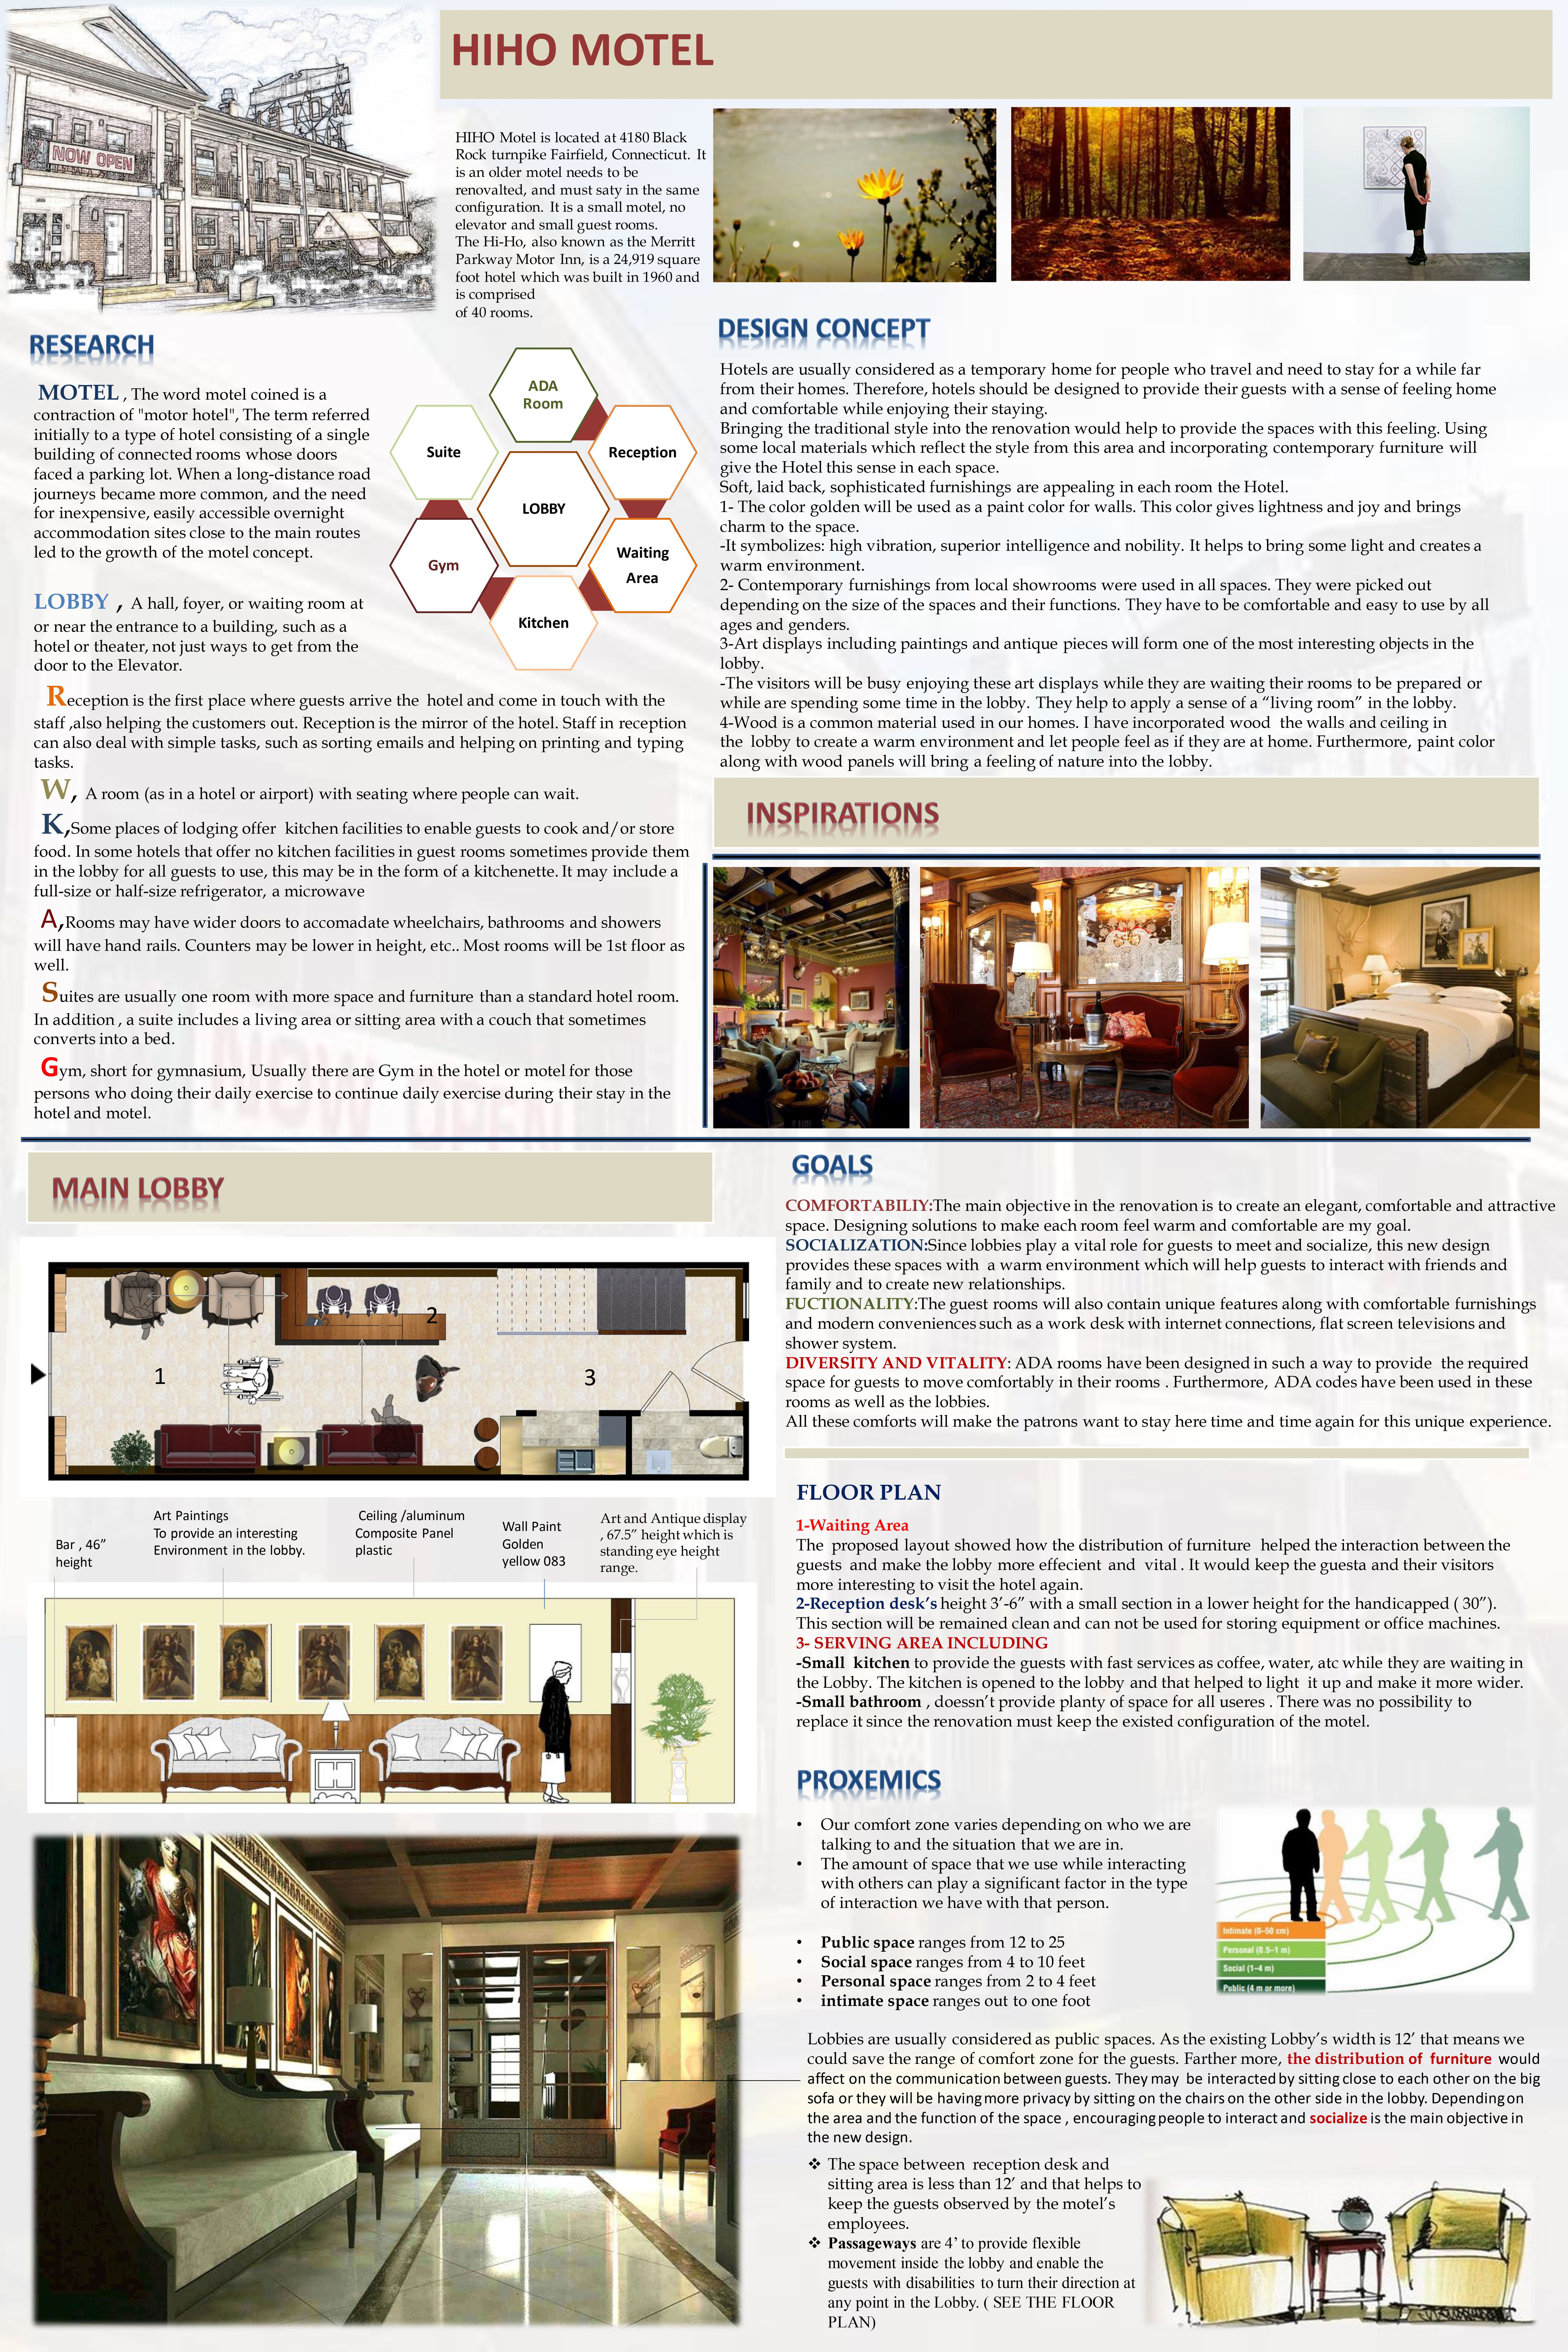 Motel Room Interiors: Human Factor Studies Of HIHO Motel Design